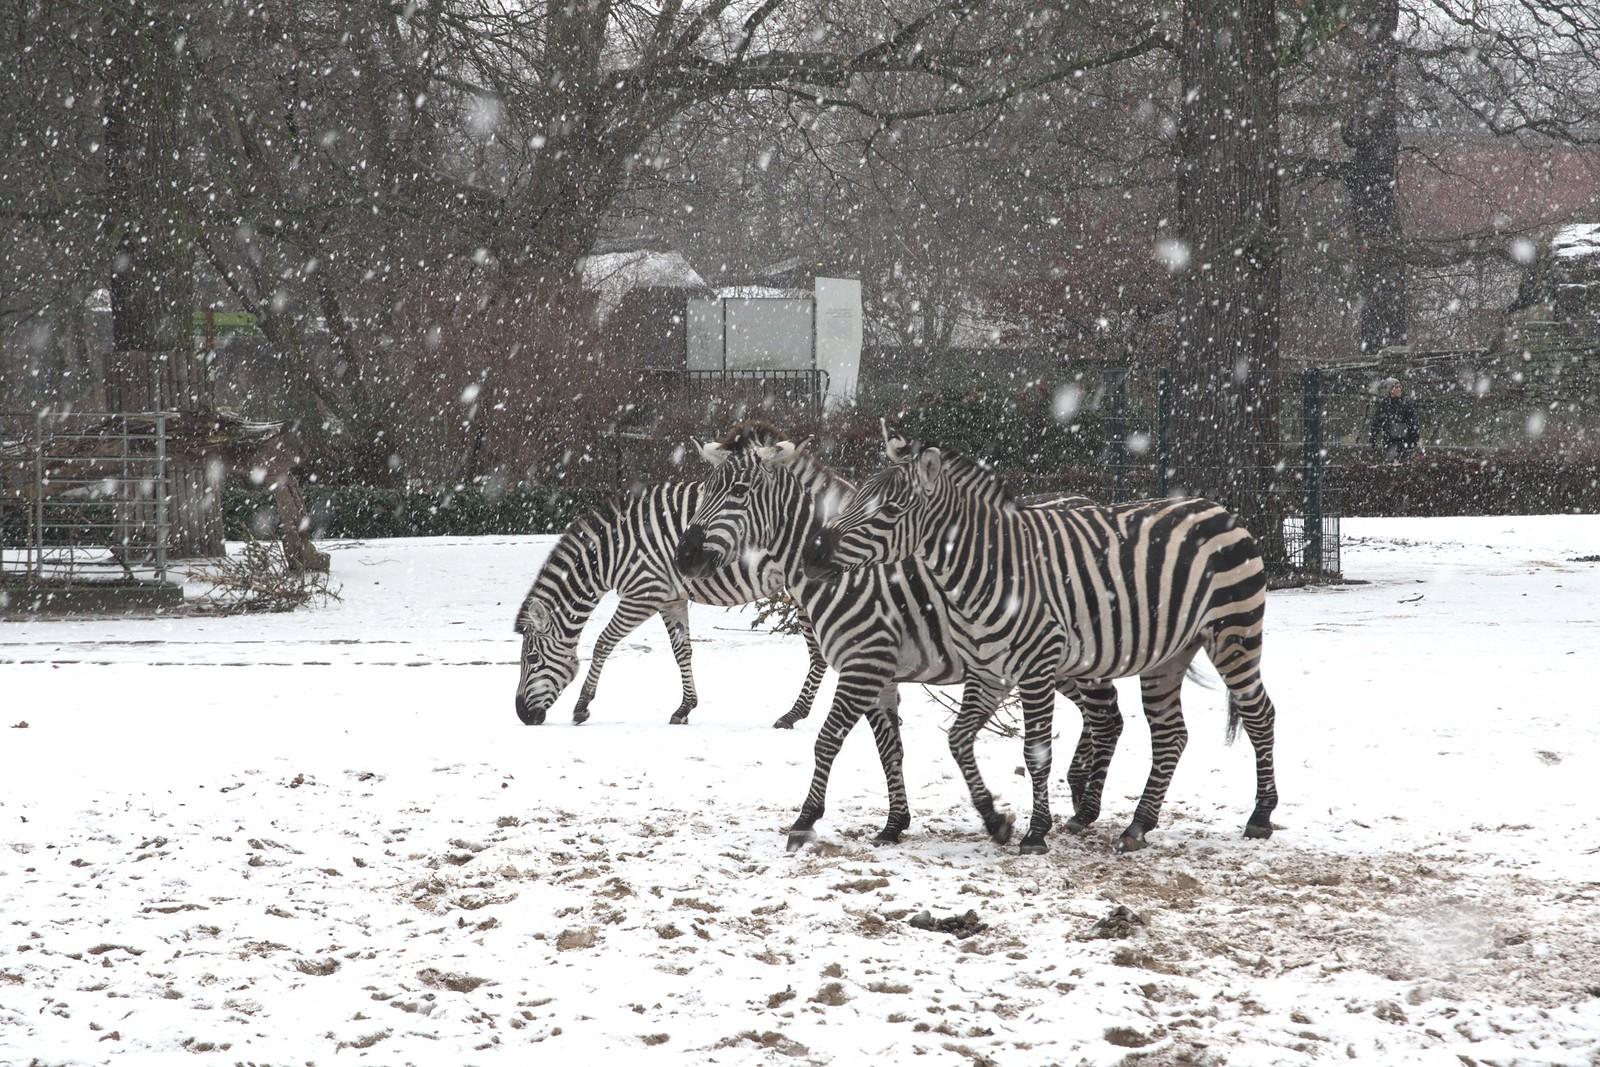 Berlin (zoological garden) | by Hg T